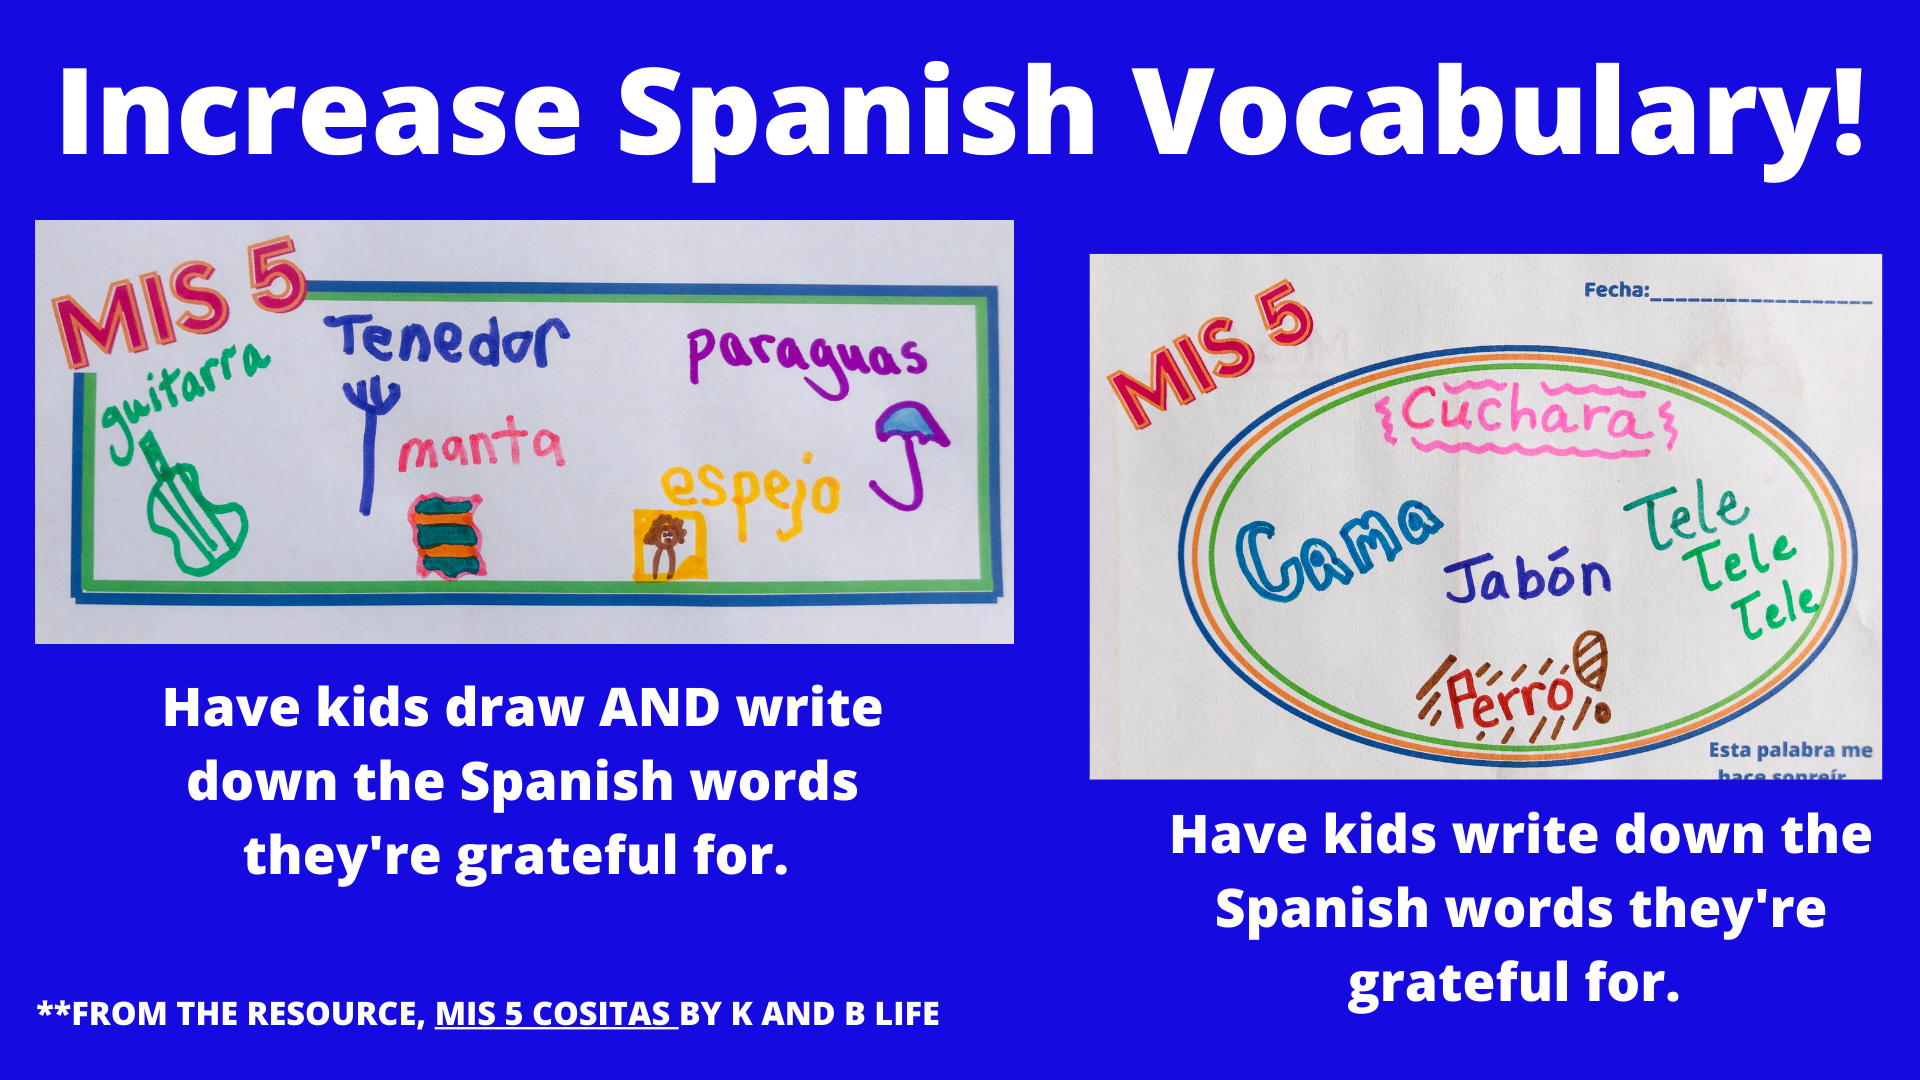 Using gratitude journaling to help increase Spanish vocabulary. https://kandblife.com